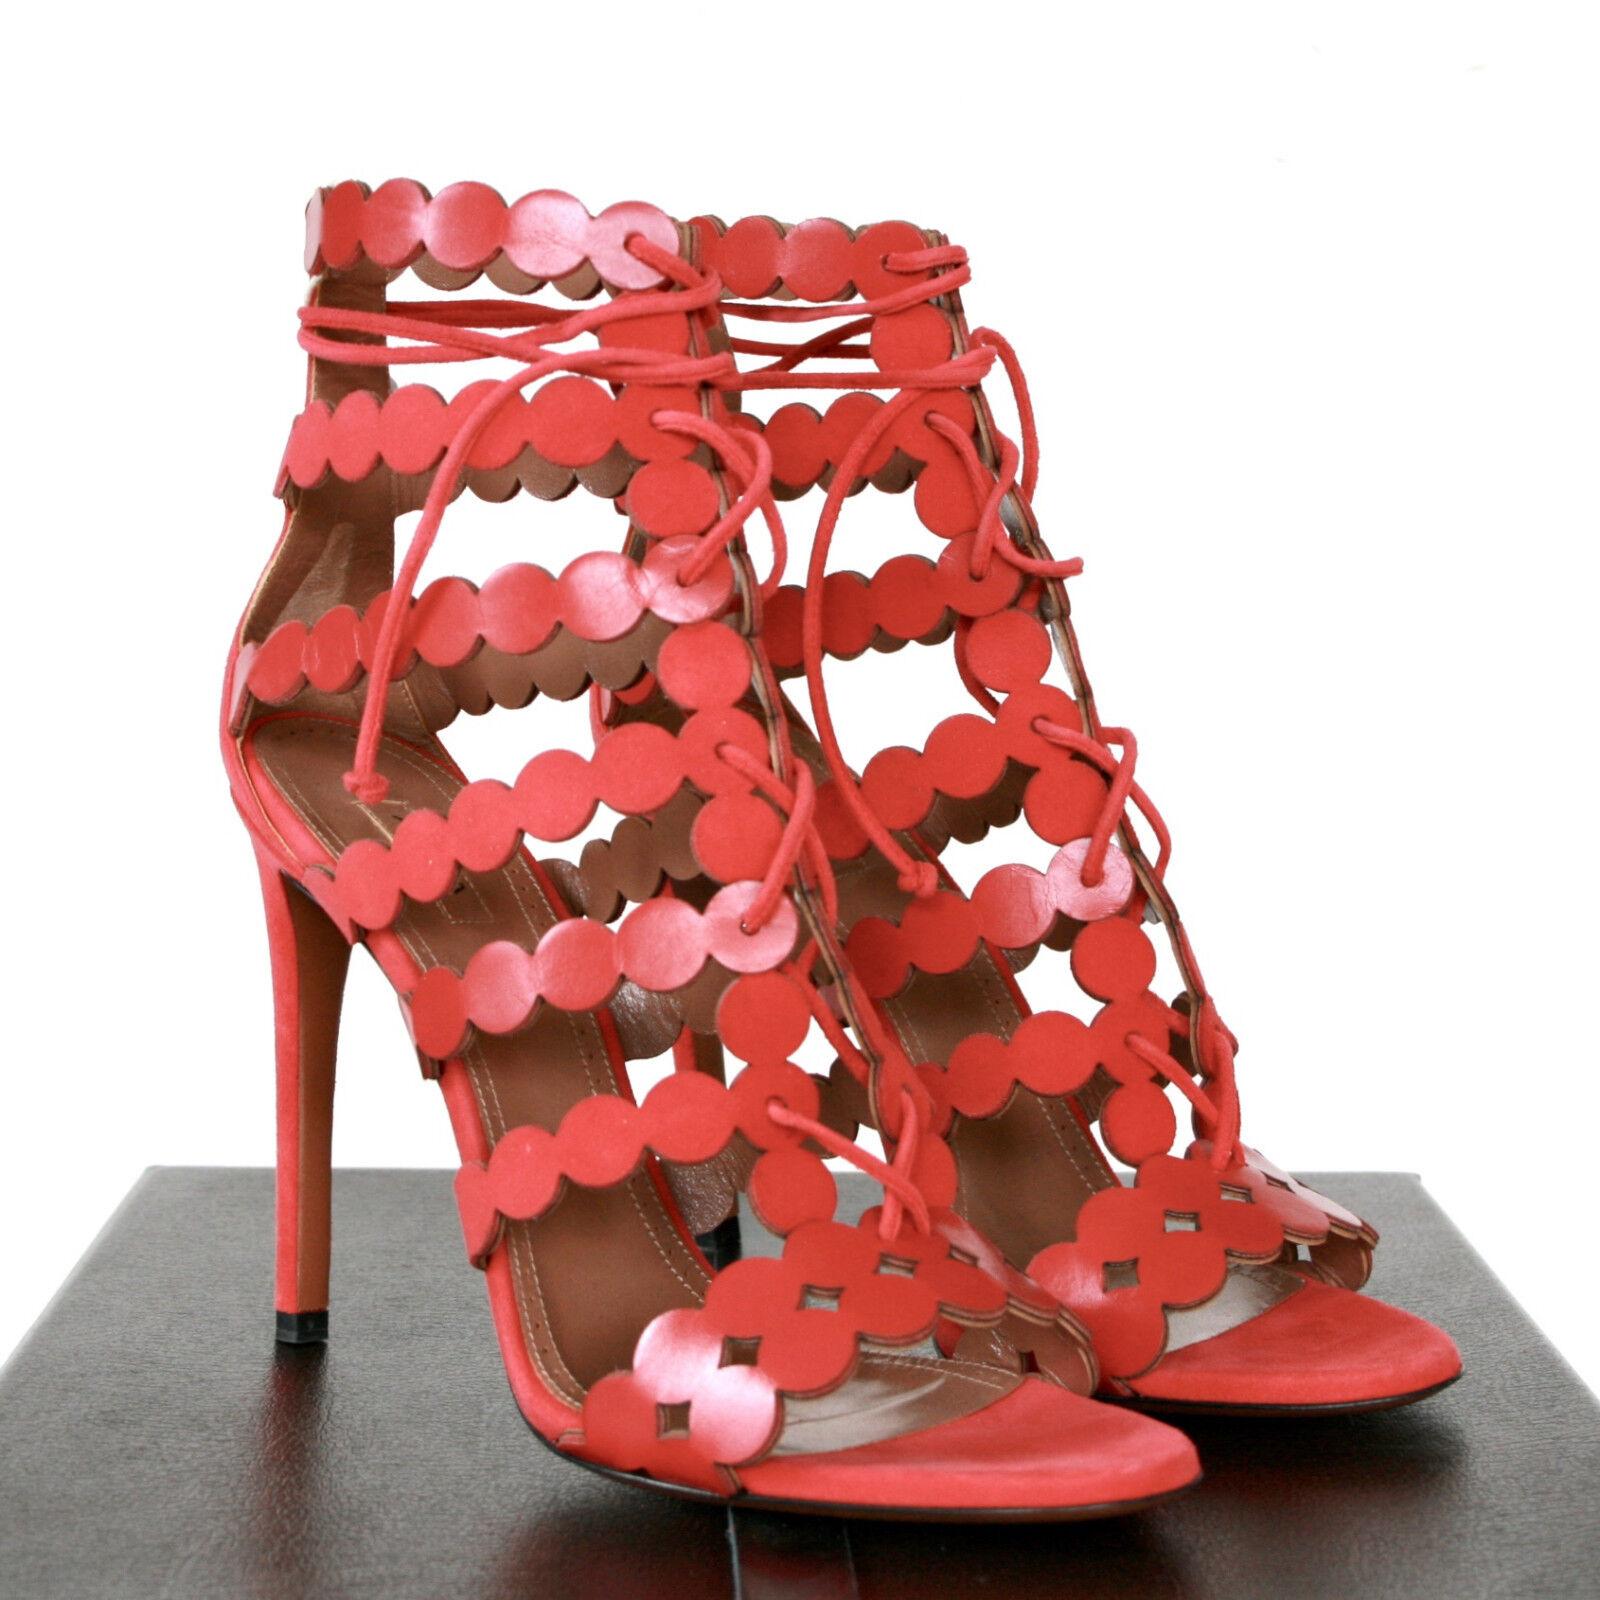 ALAIA  1,750 cutout circle dot high heel sandals alaïa rot pumps schuhe 39.5 NEW